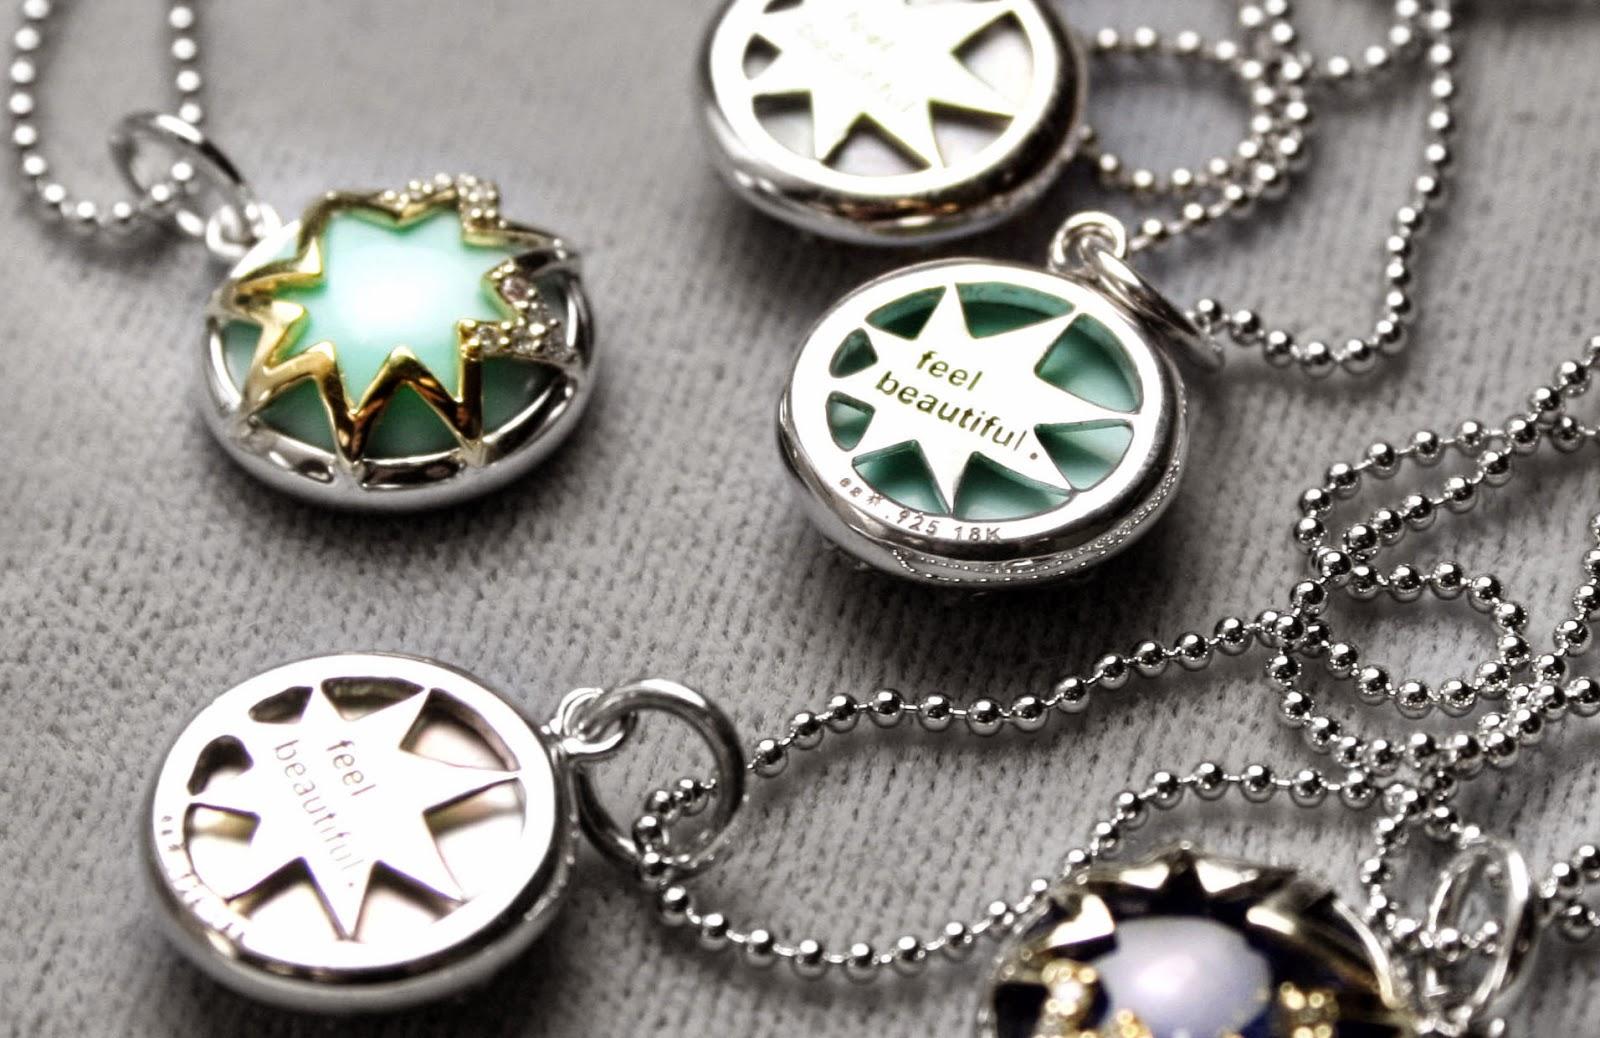 http://elizabethshowers.com/products.htm?jewelry=Decoder